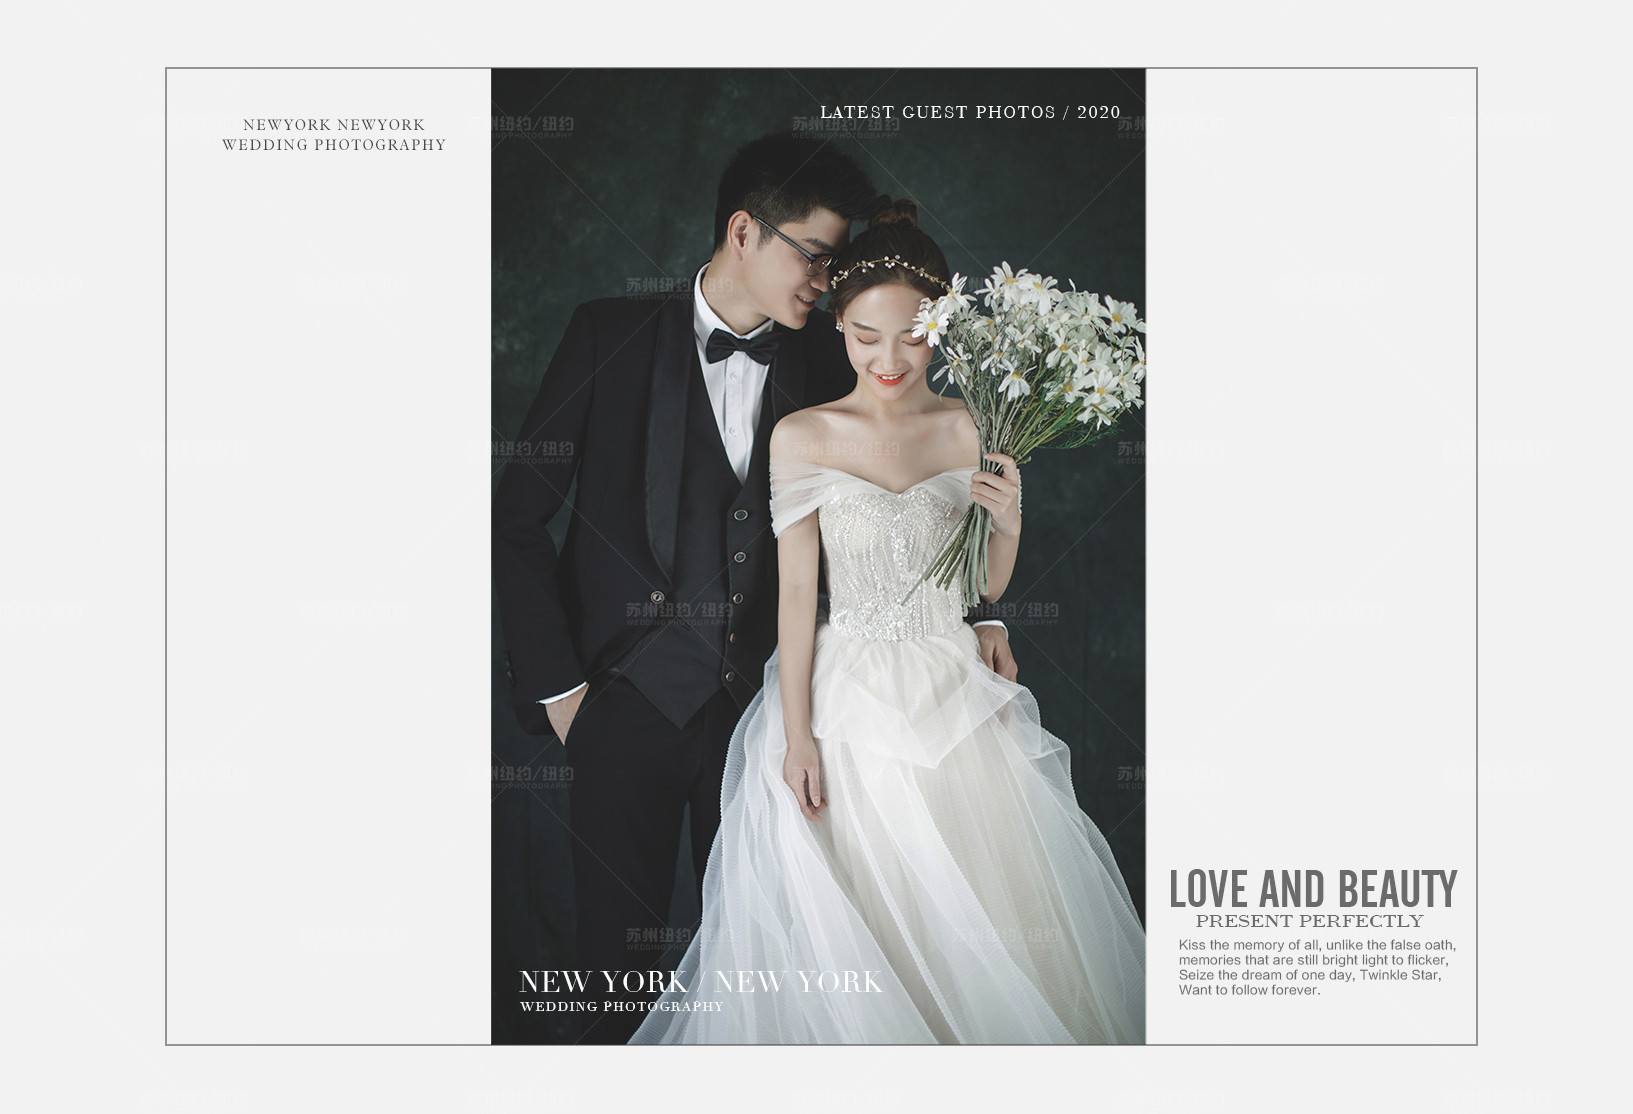 Mr.戴 & Ms.戴(纽约纽约最新客照)婚纱摄影照